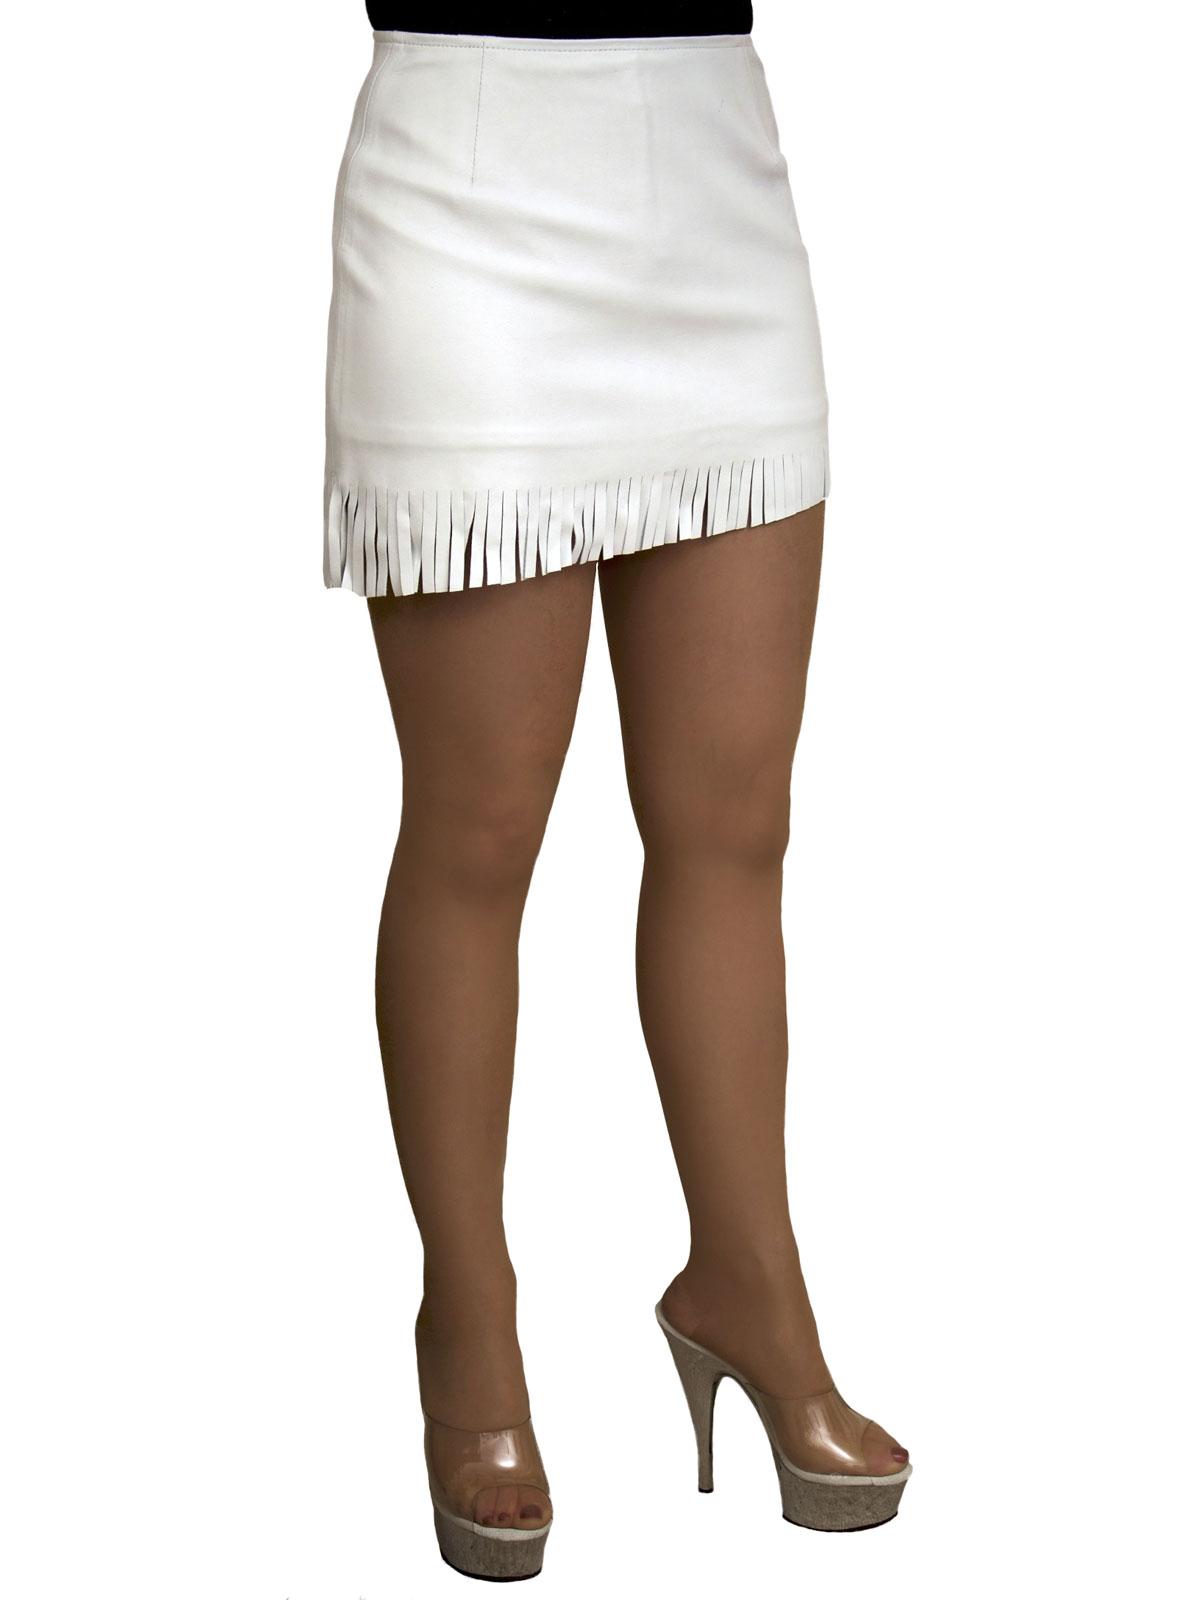 soft leather mini skirt with fringed slant hem tout ensemble